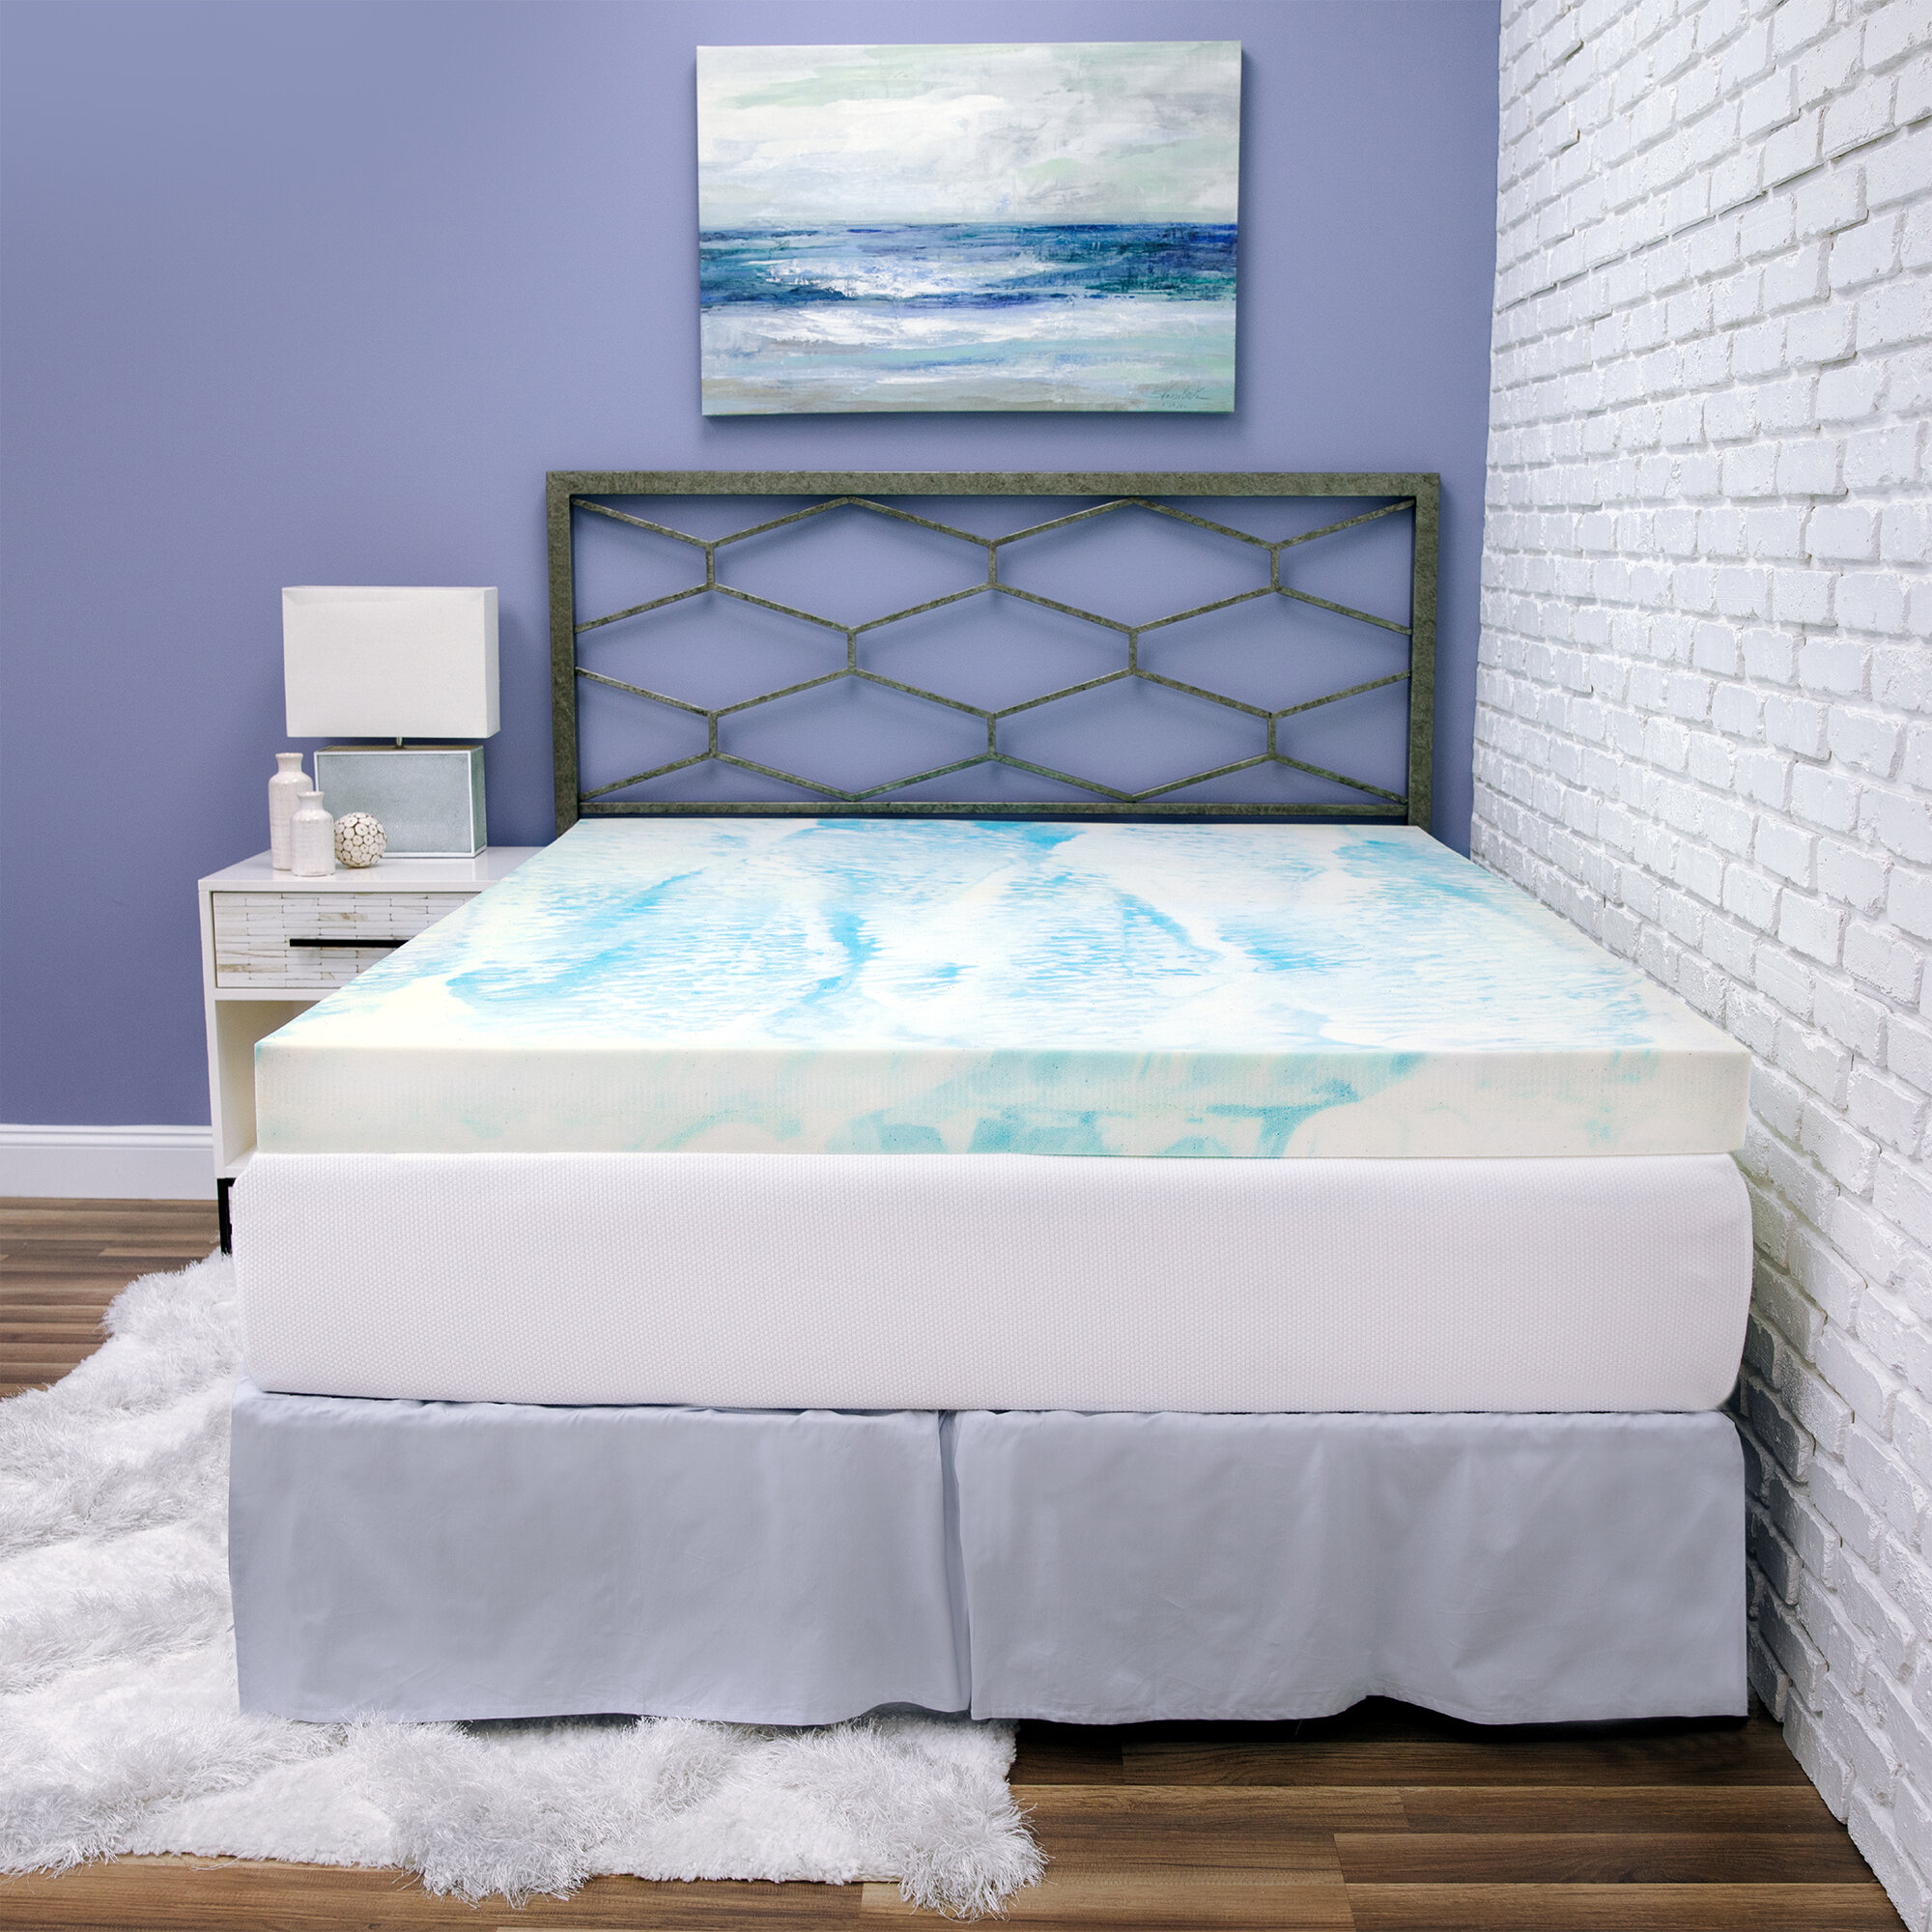 Biopedic Gel Swirl 4 Memory Foam Mattress Topper Reviews Wayfair